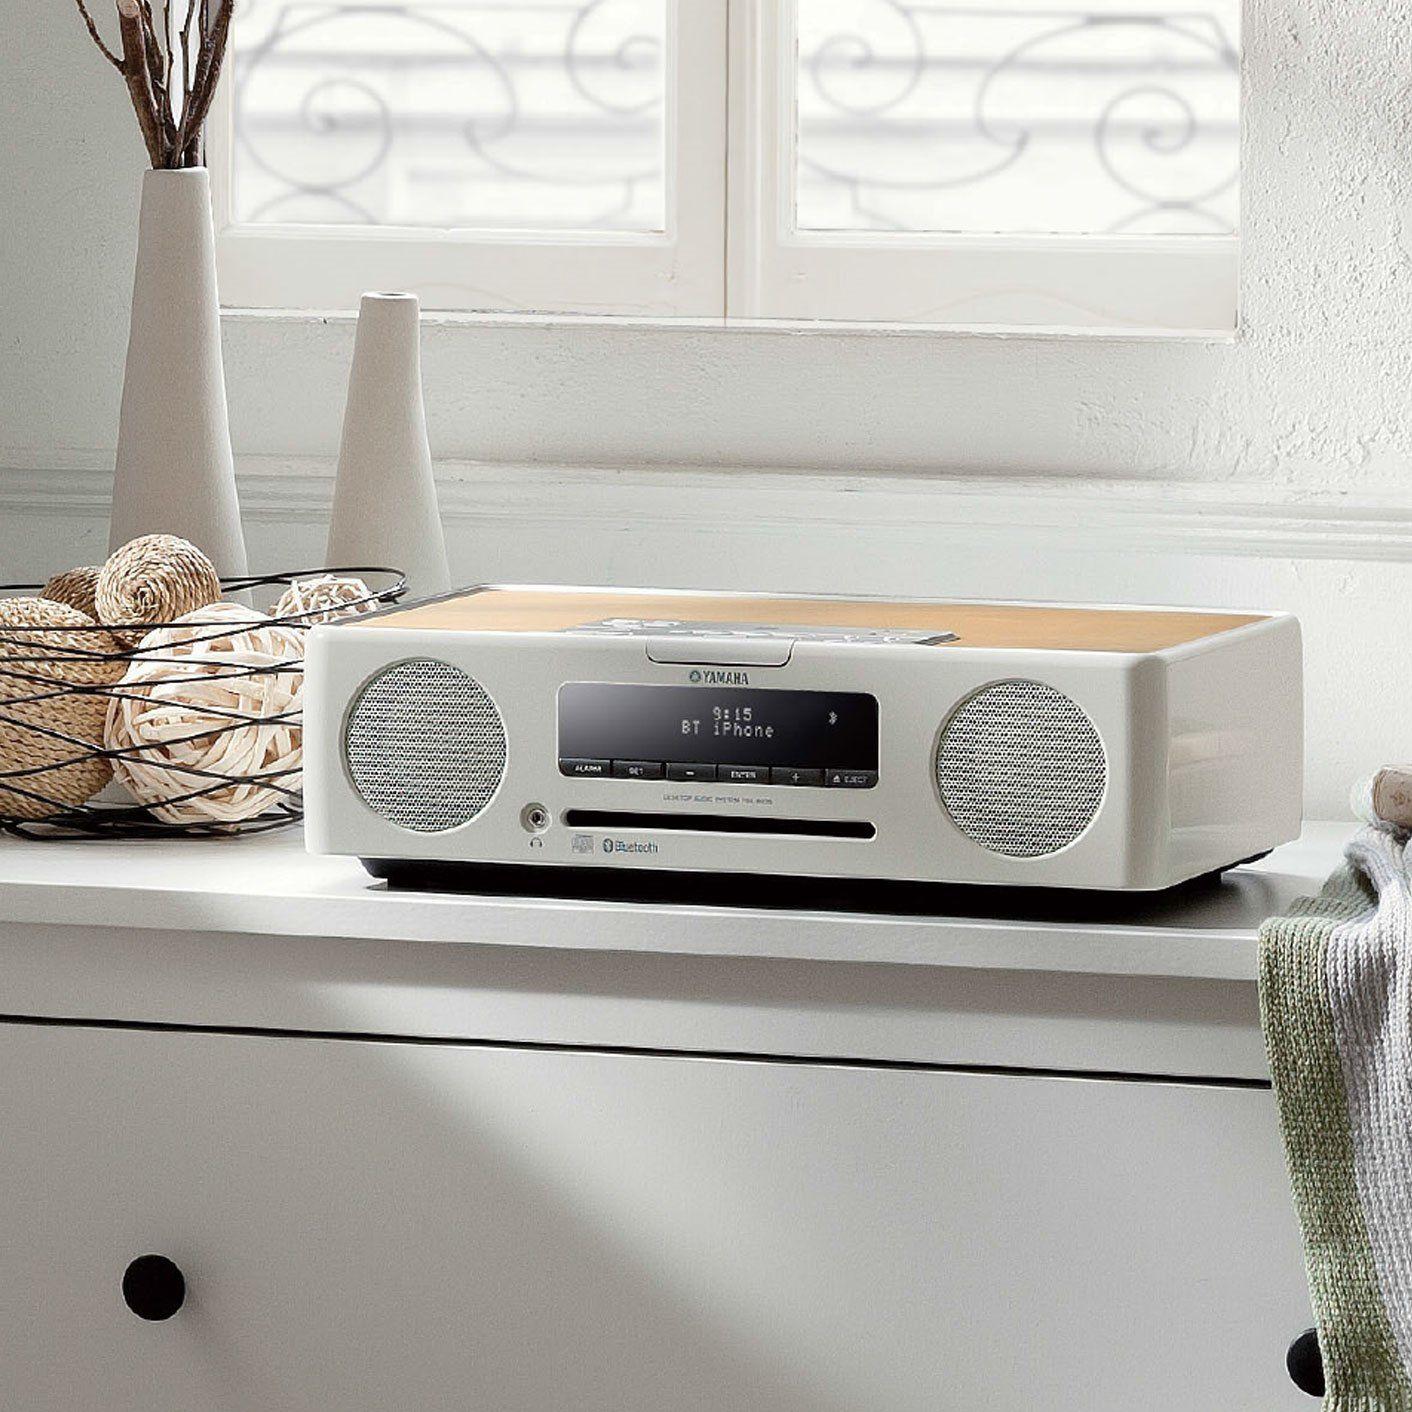 yamaha tsx b235d speaker feat digital radio bluetooth. Black Bedroom Furniture Sets. Home Design Ideas